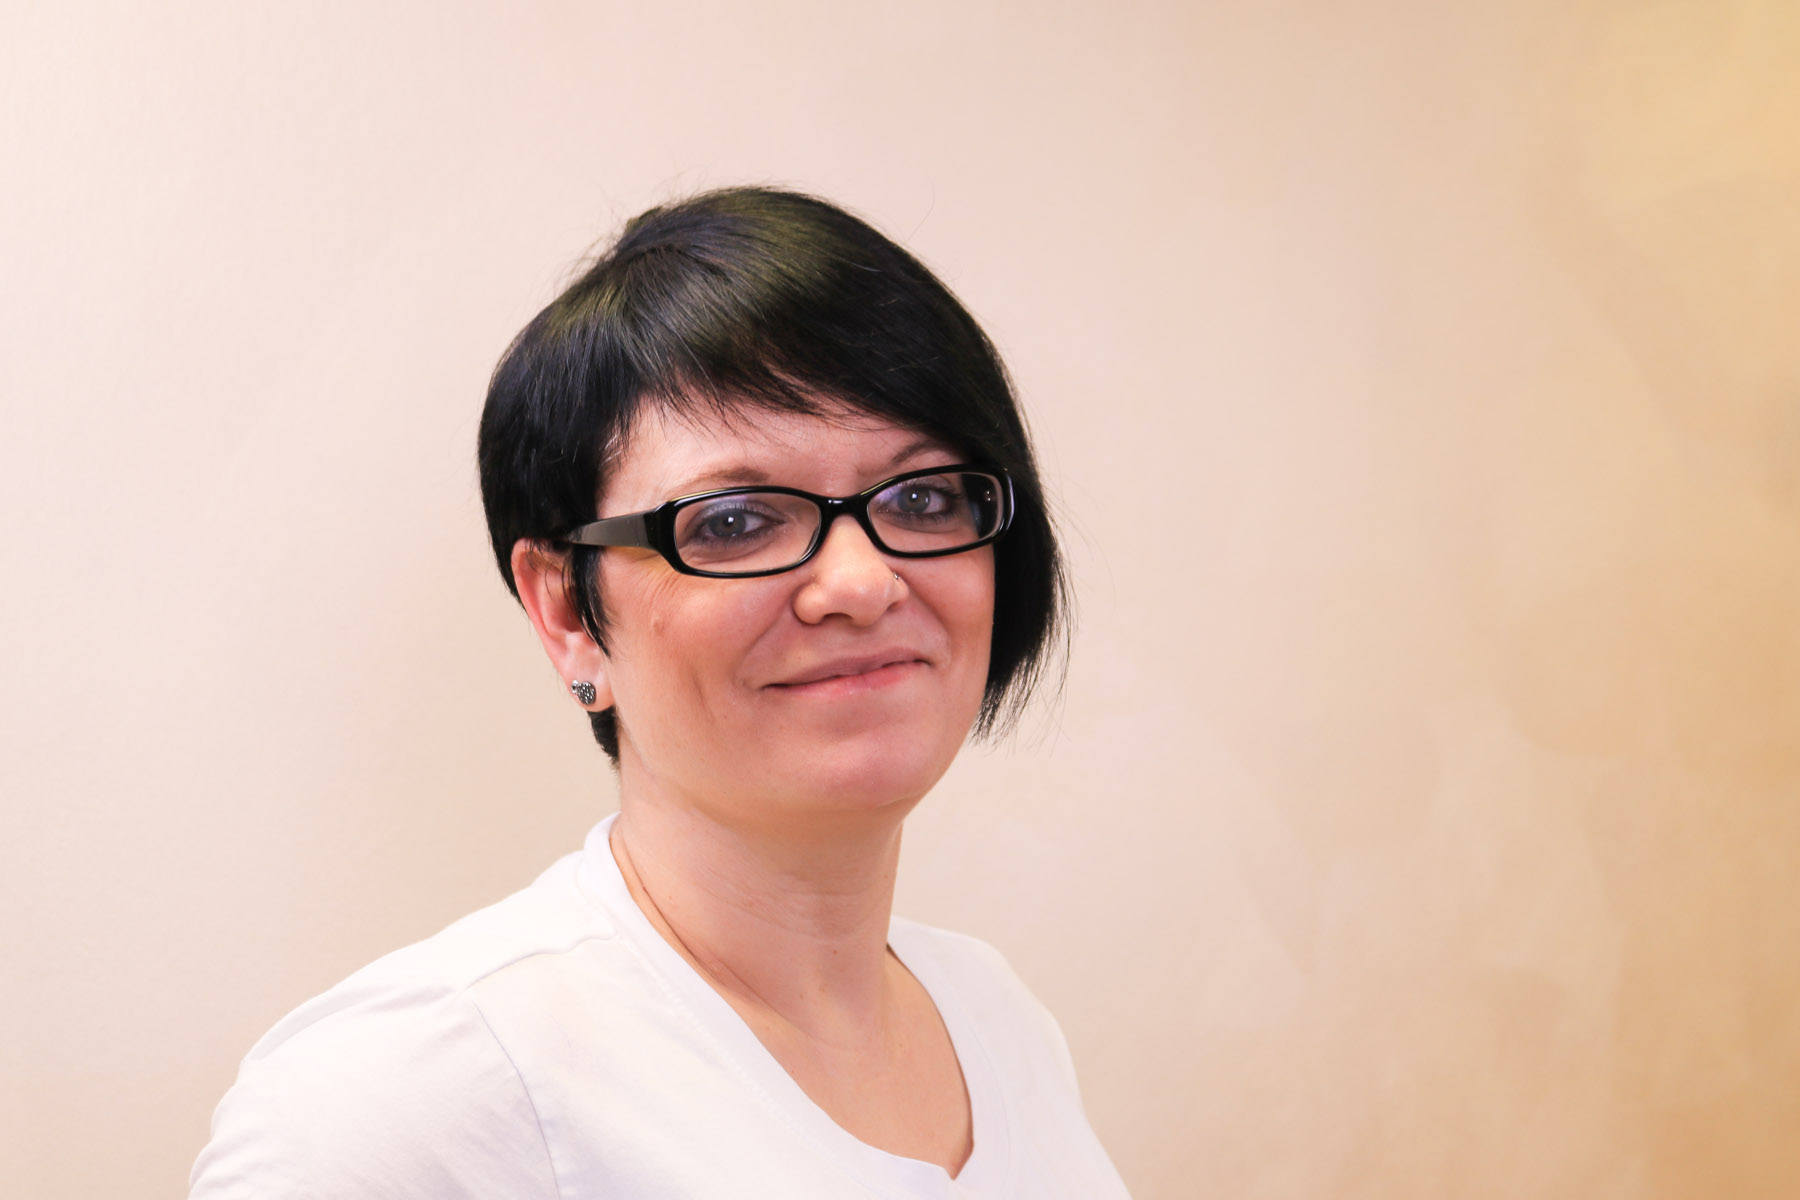 Claudia Greschner